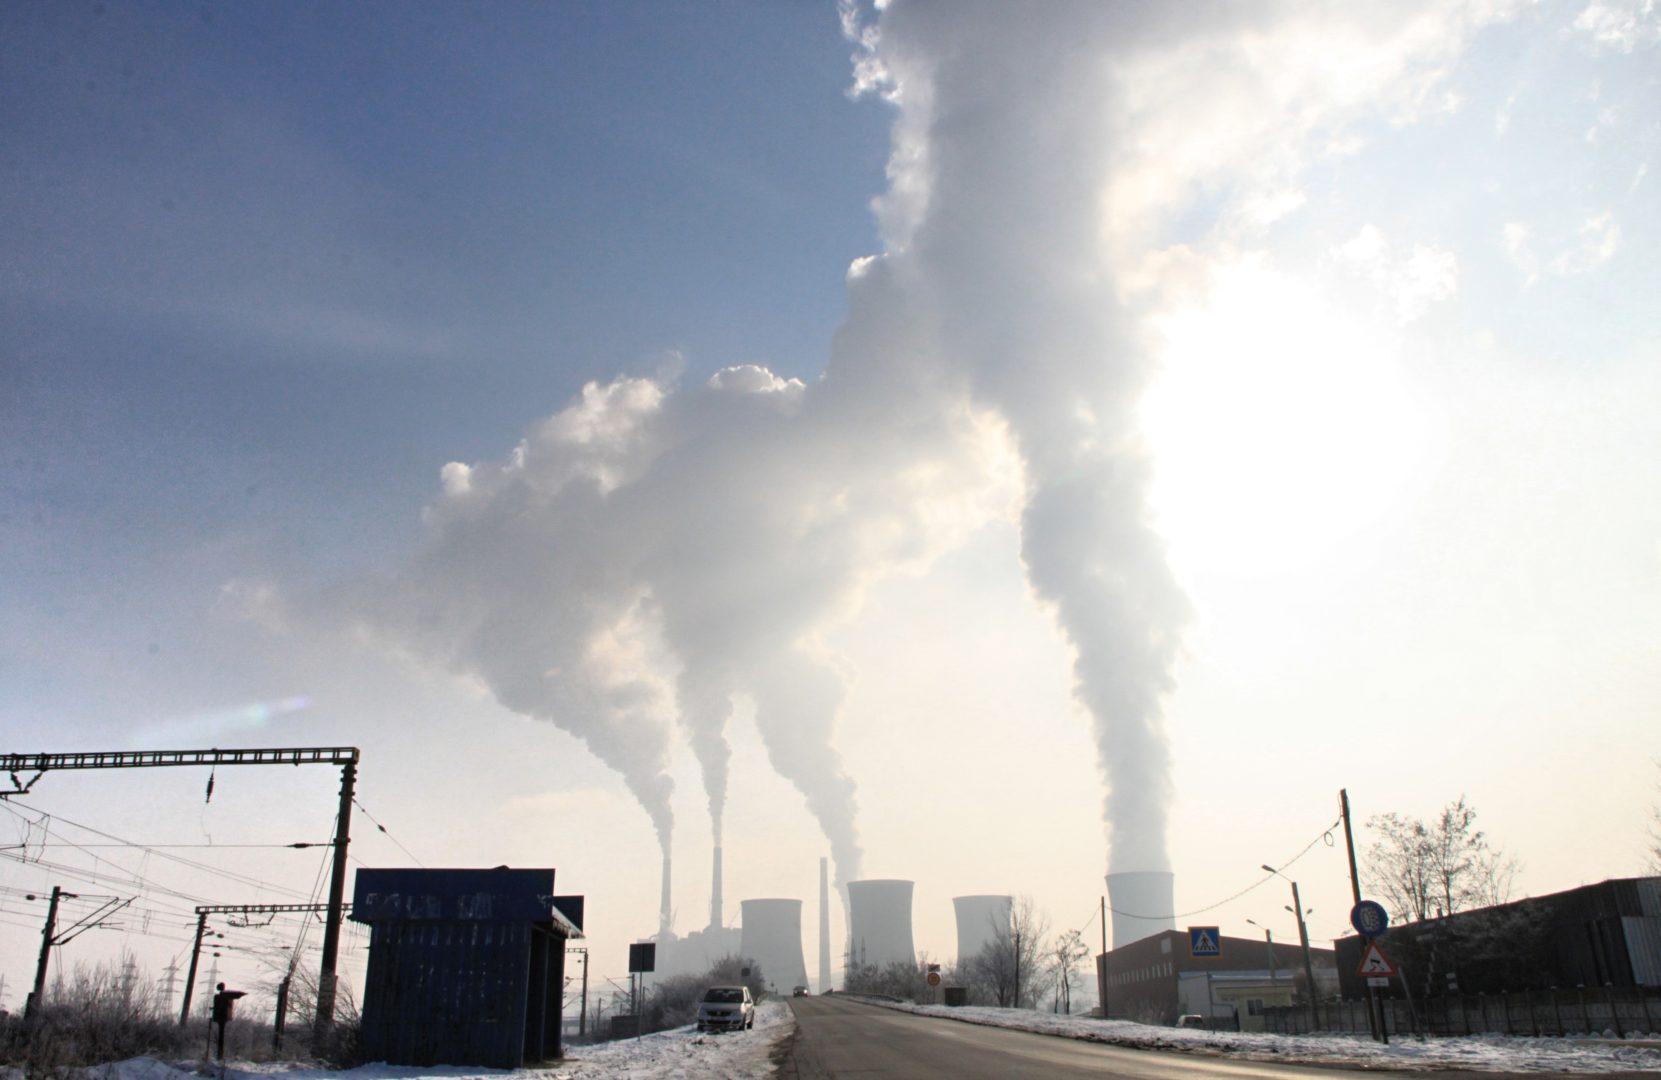 emisiones globales de CO2 en 2018